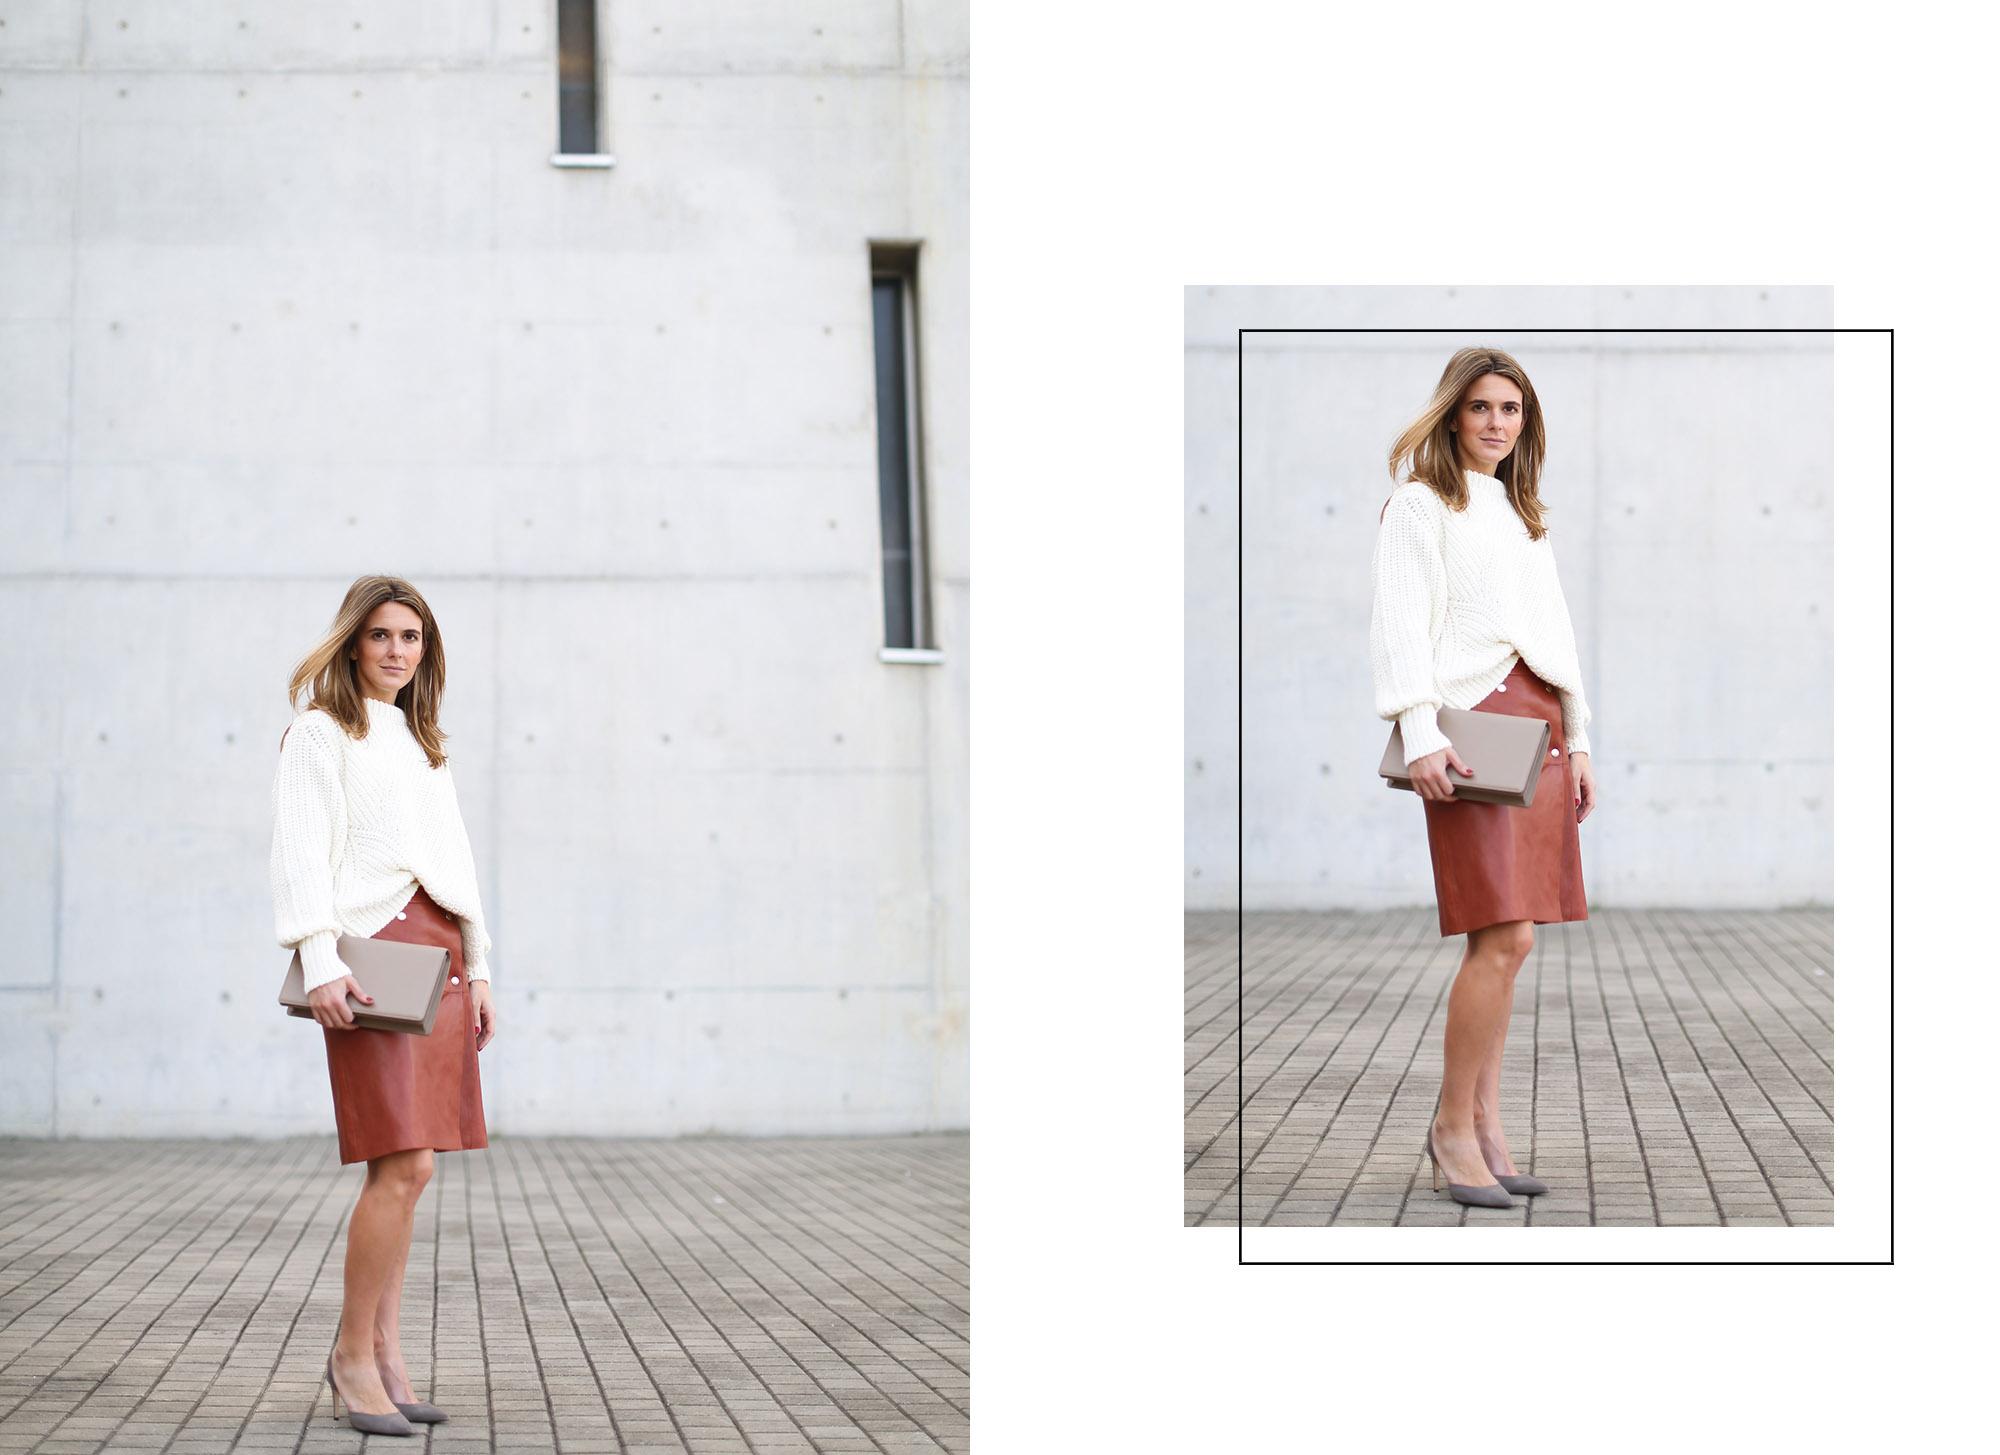 Clochet_streetstyle_steve_mono_leather_bag_trimmerbilbao_filippaK_leatherskirt-20